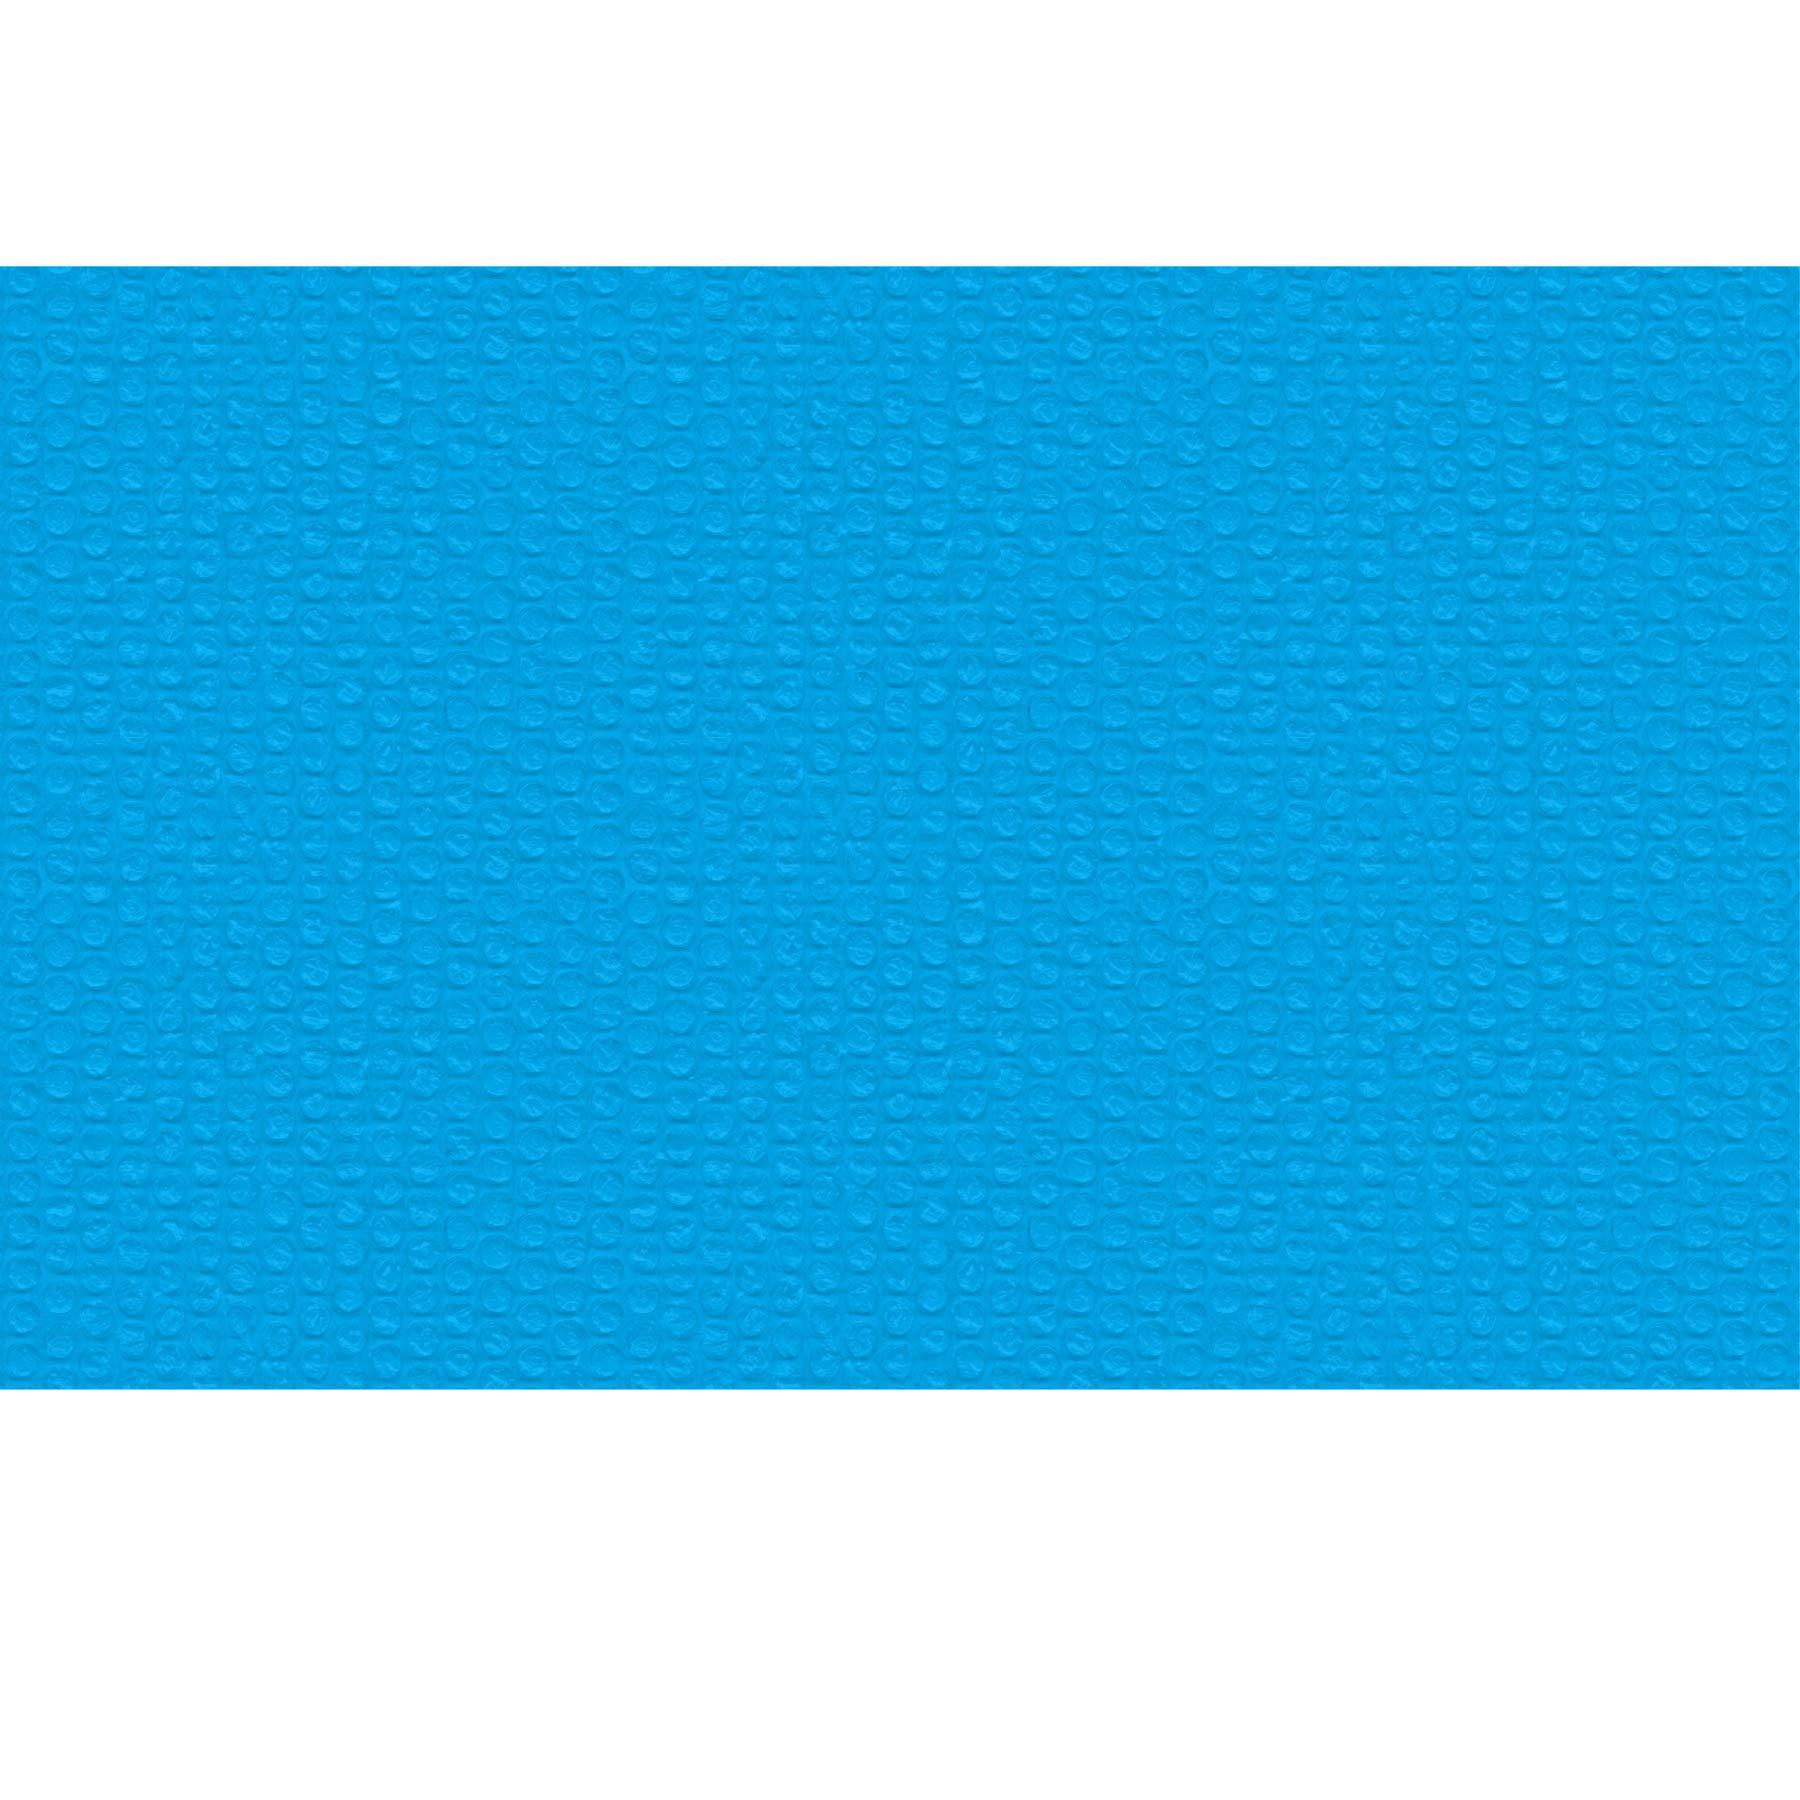 TecTake 800711 Manta Solar para Piscina, Cubierta Rectangular Impermeable, Acortable, Azul - Varios Tamaños (1, 6 x 2, 6 m | 403101): Amazon.es: Jardín